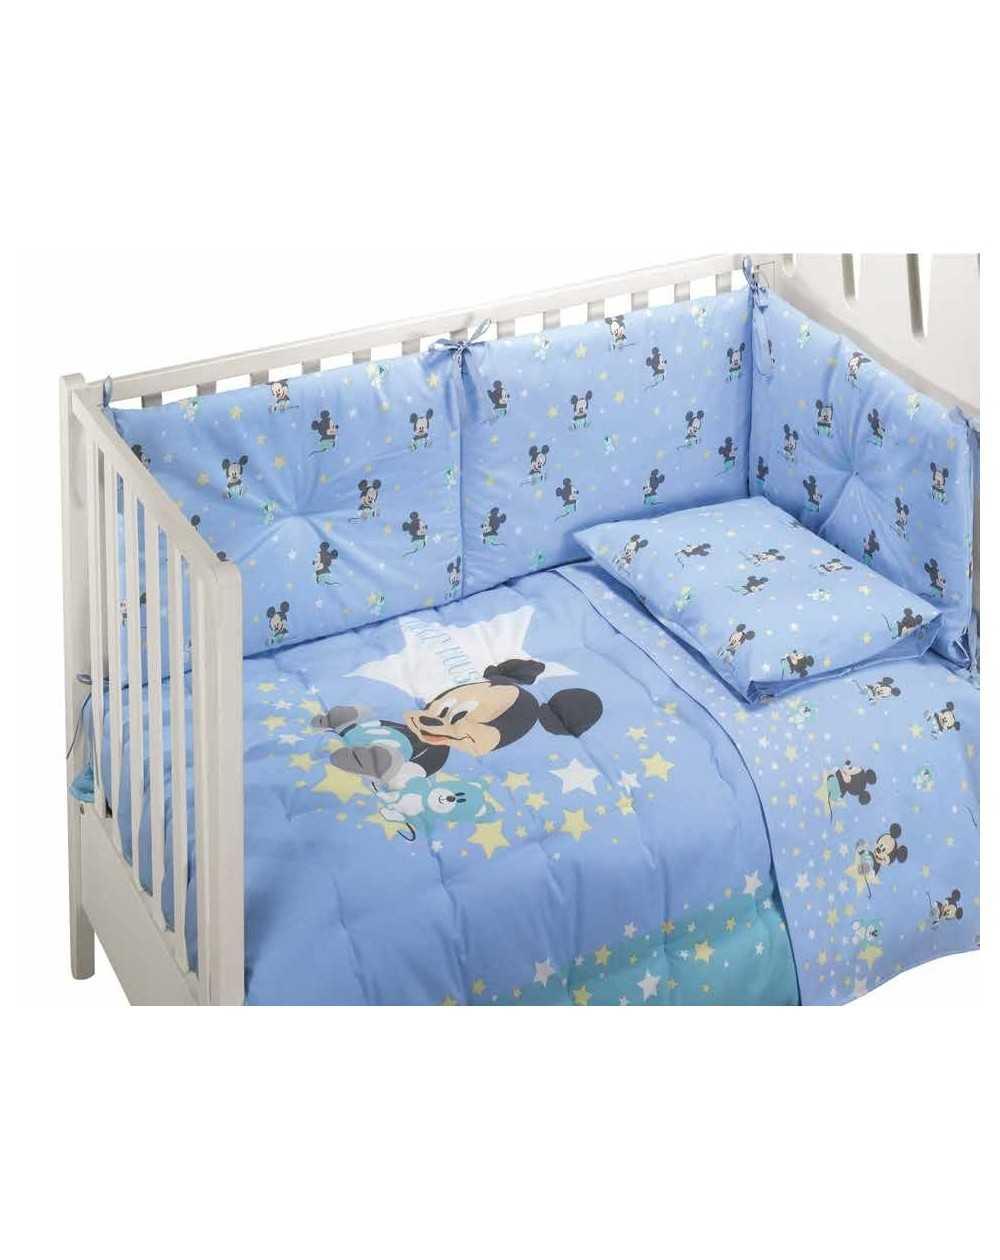 Ensemble tours de lit dredons b b s mickey dream baby for Housse tour de lit bebe